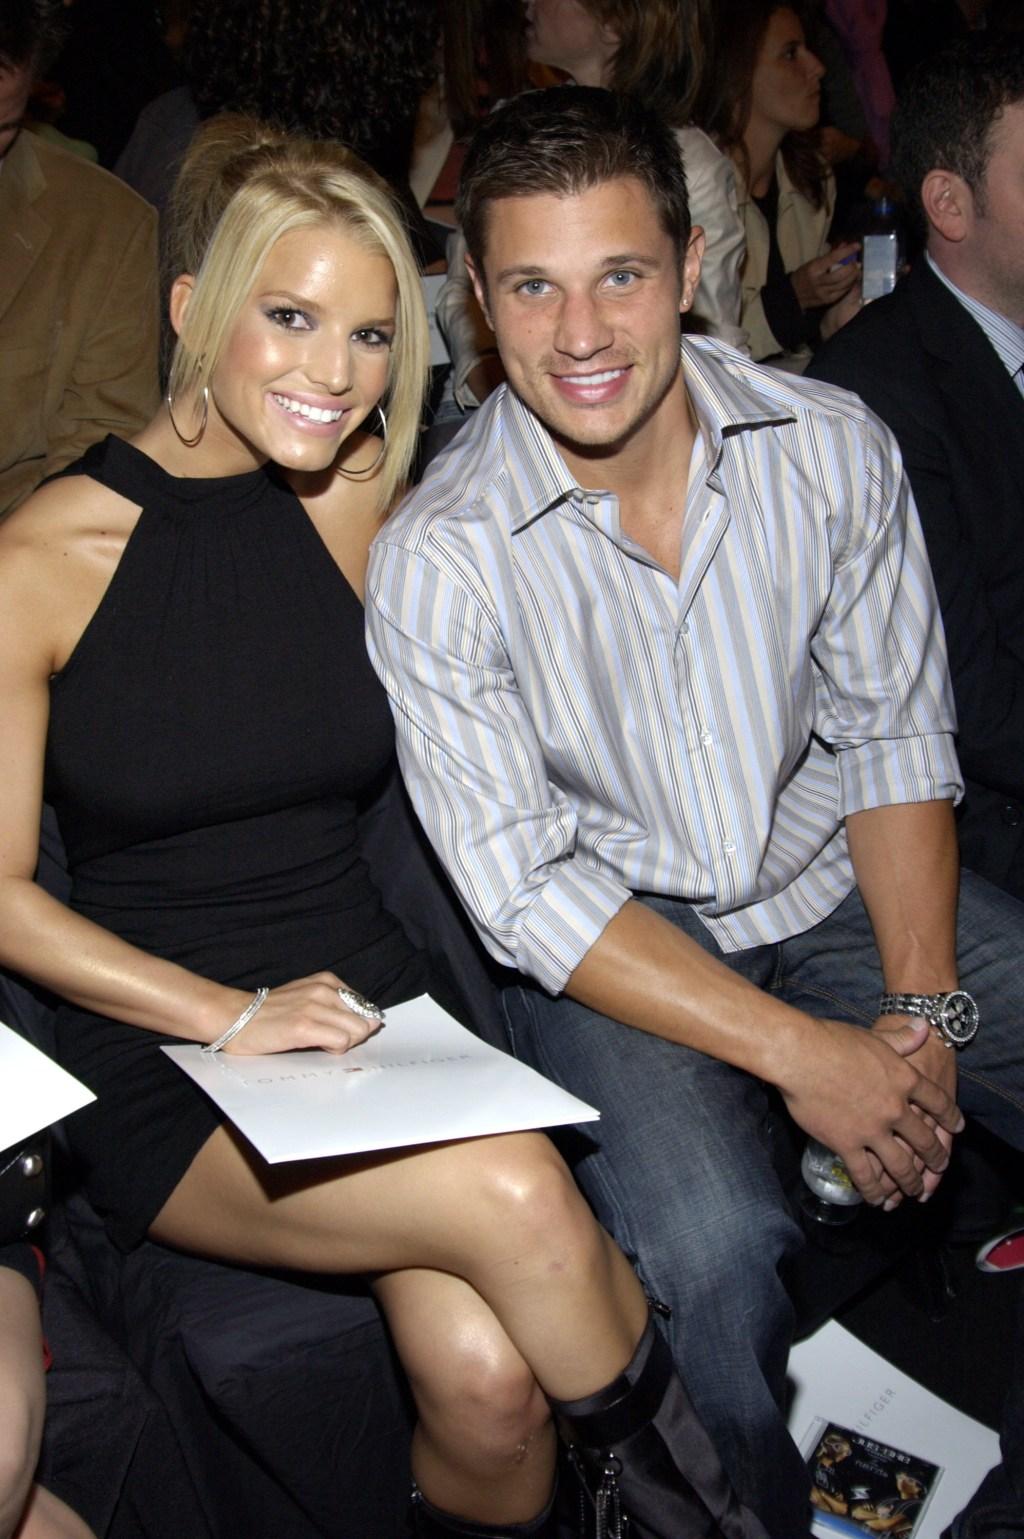 Jessica Simpson, ex husband Nick Lachey